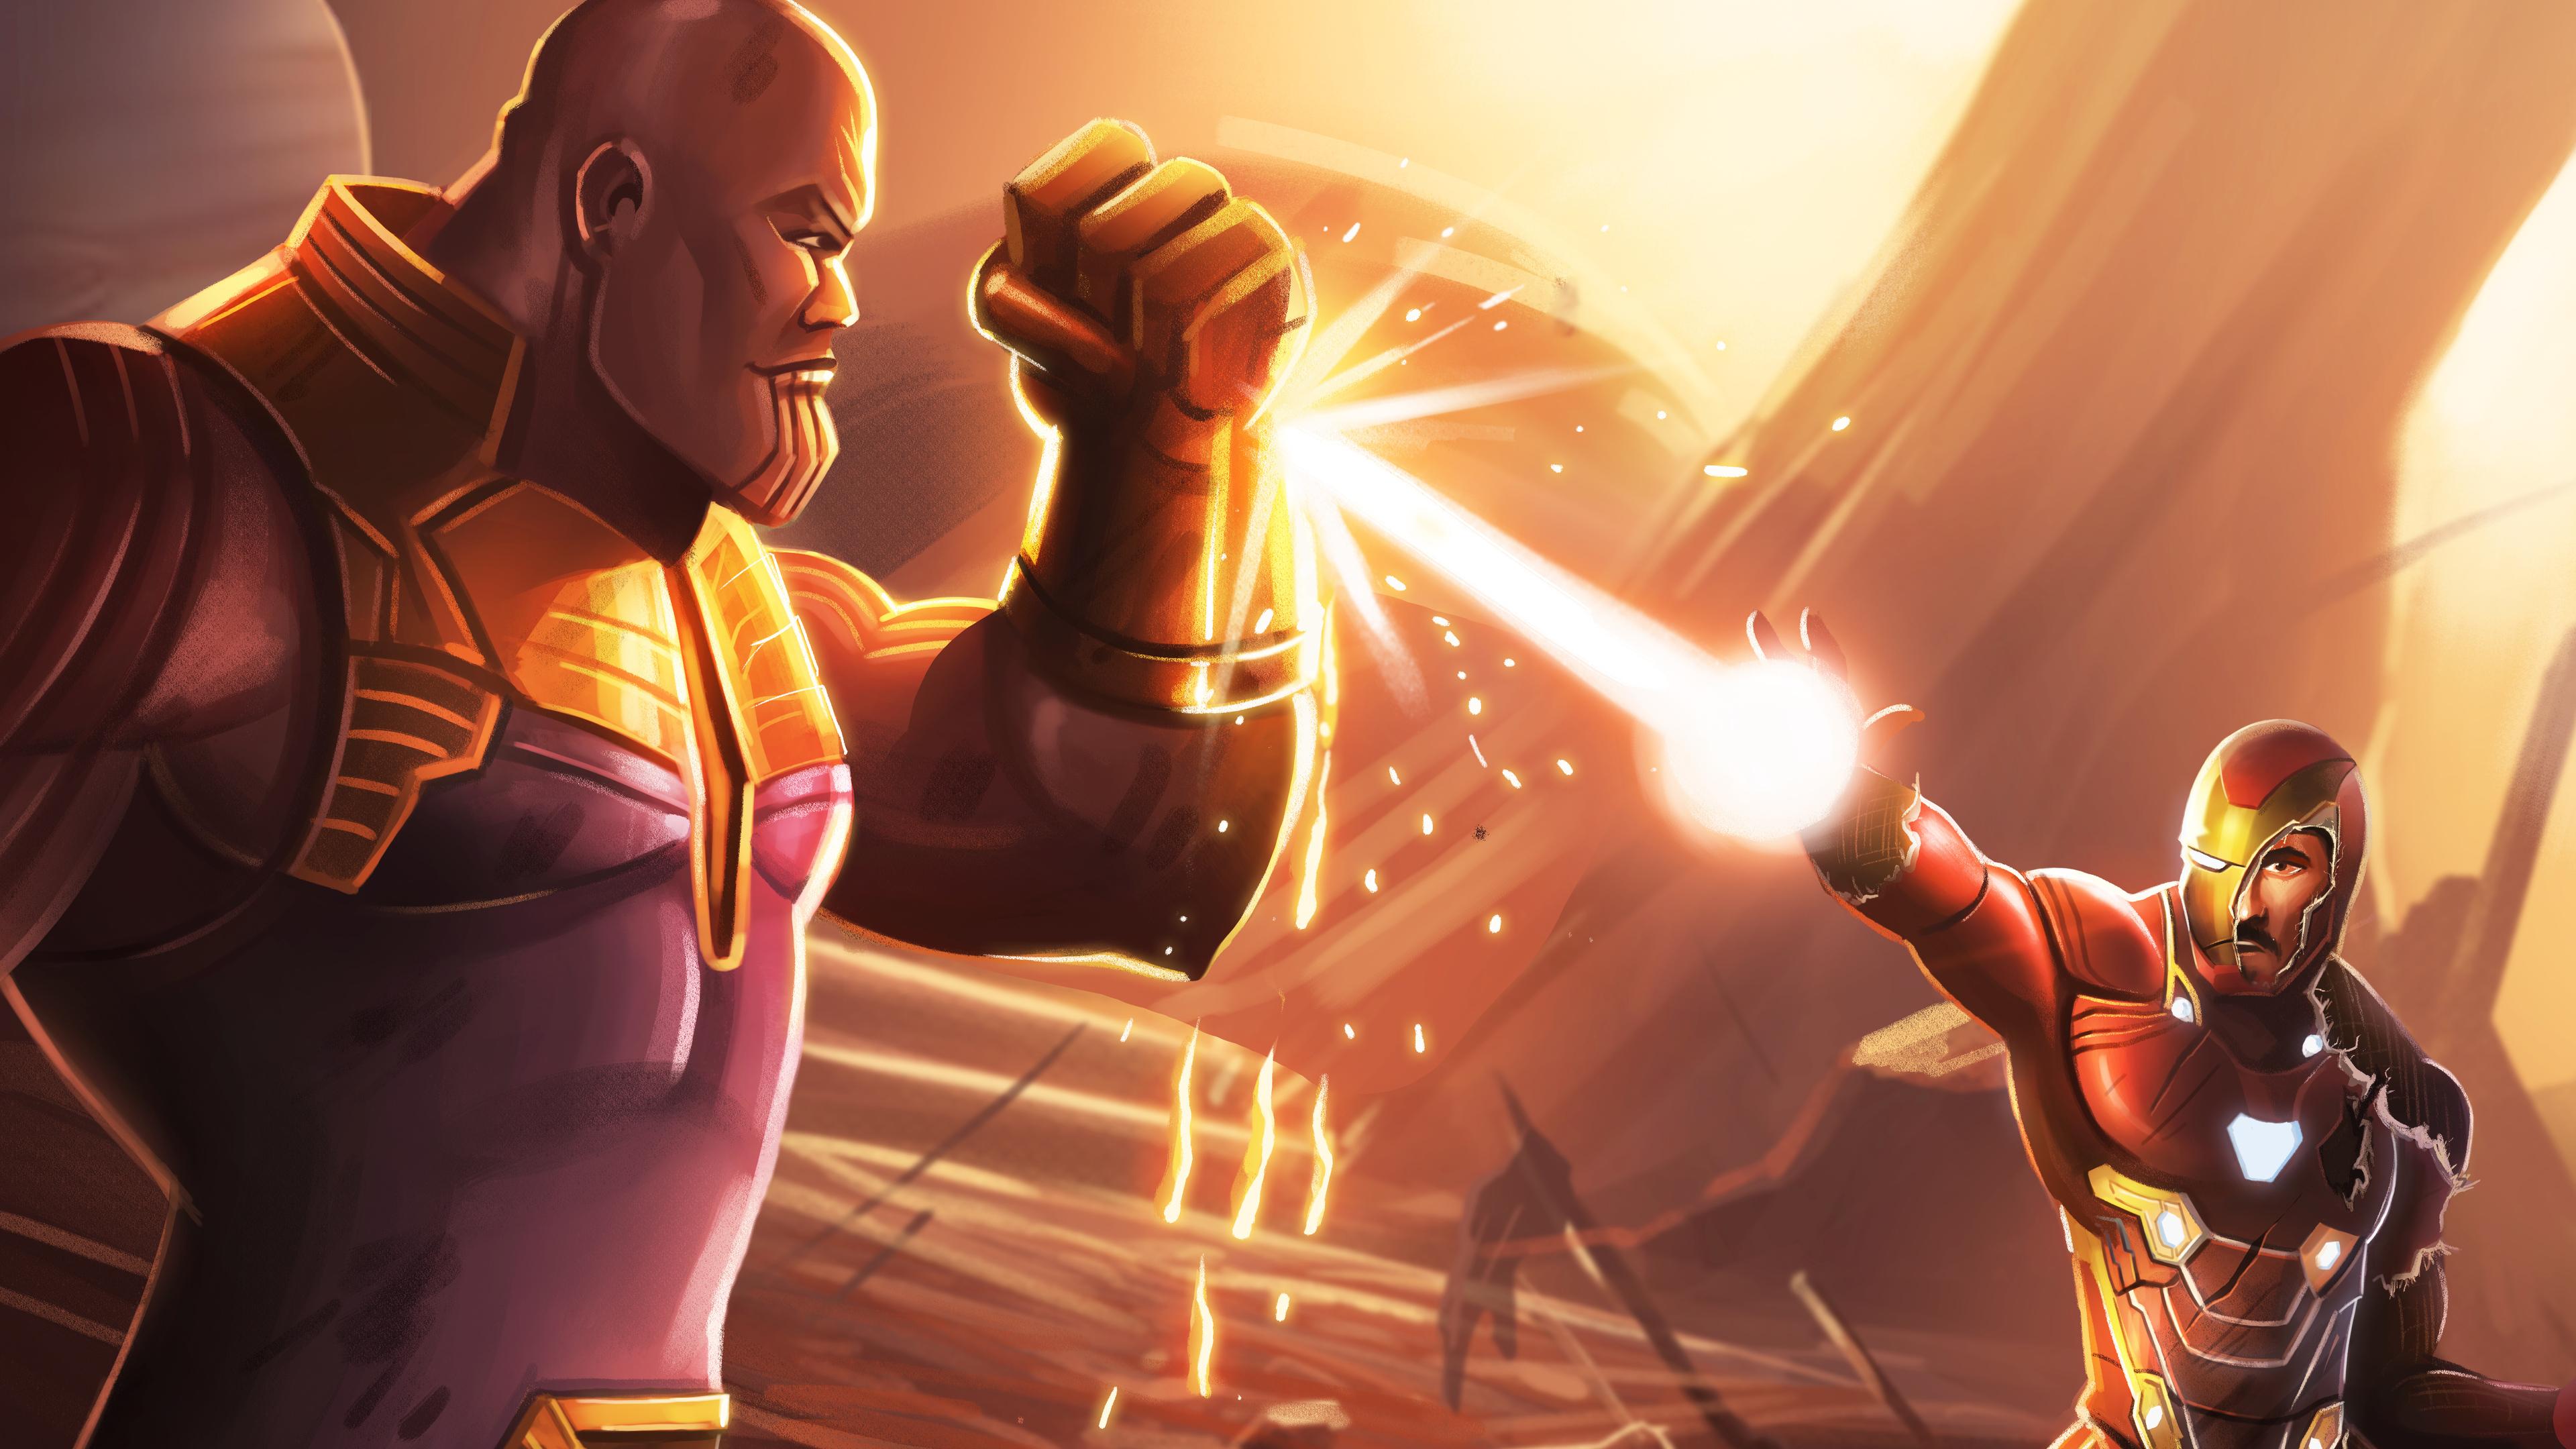 thanos and iron man 1563220149 - Thanos And Iron Man - thanos-wallpapers, superheroes wallpapers, iron man wallpapers, hd-wallpapers, deviantart wallpapers, artwork wallpapers, 5k wallpapers, 4k-wallpapers